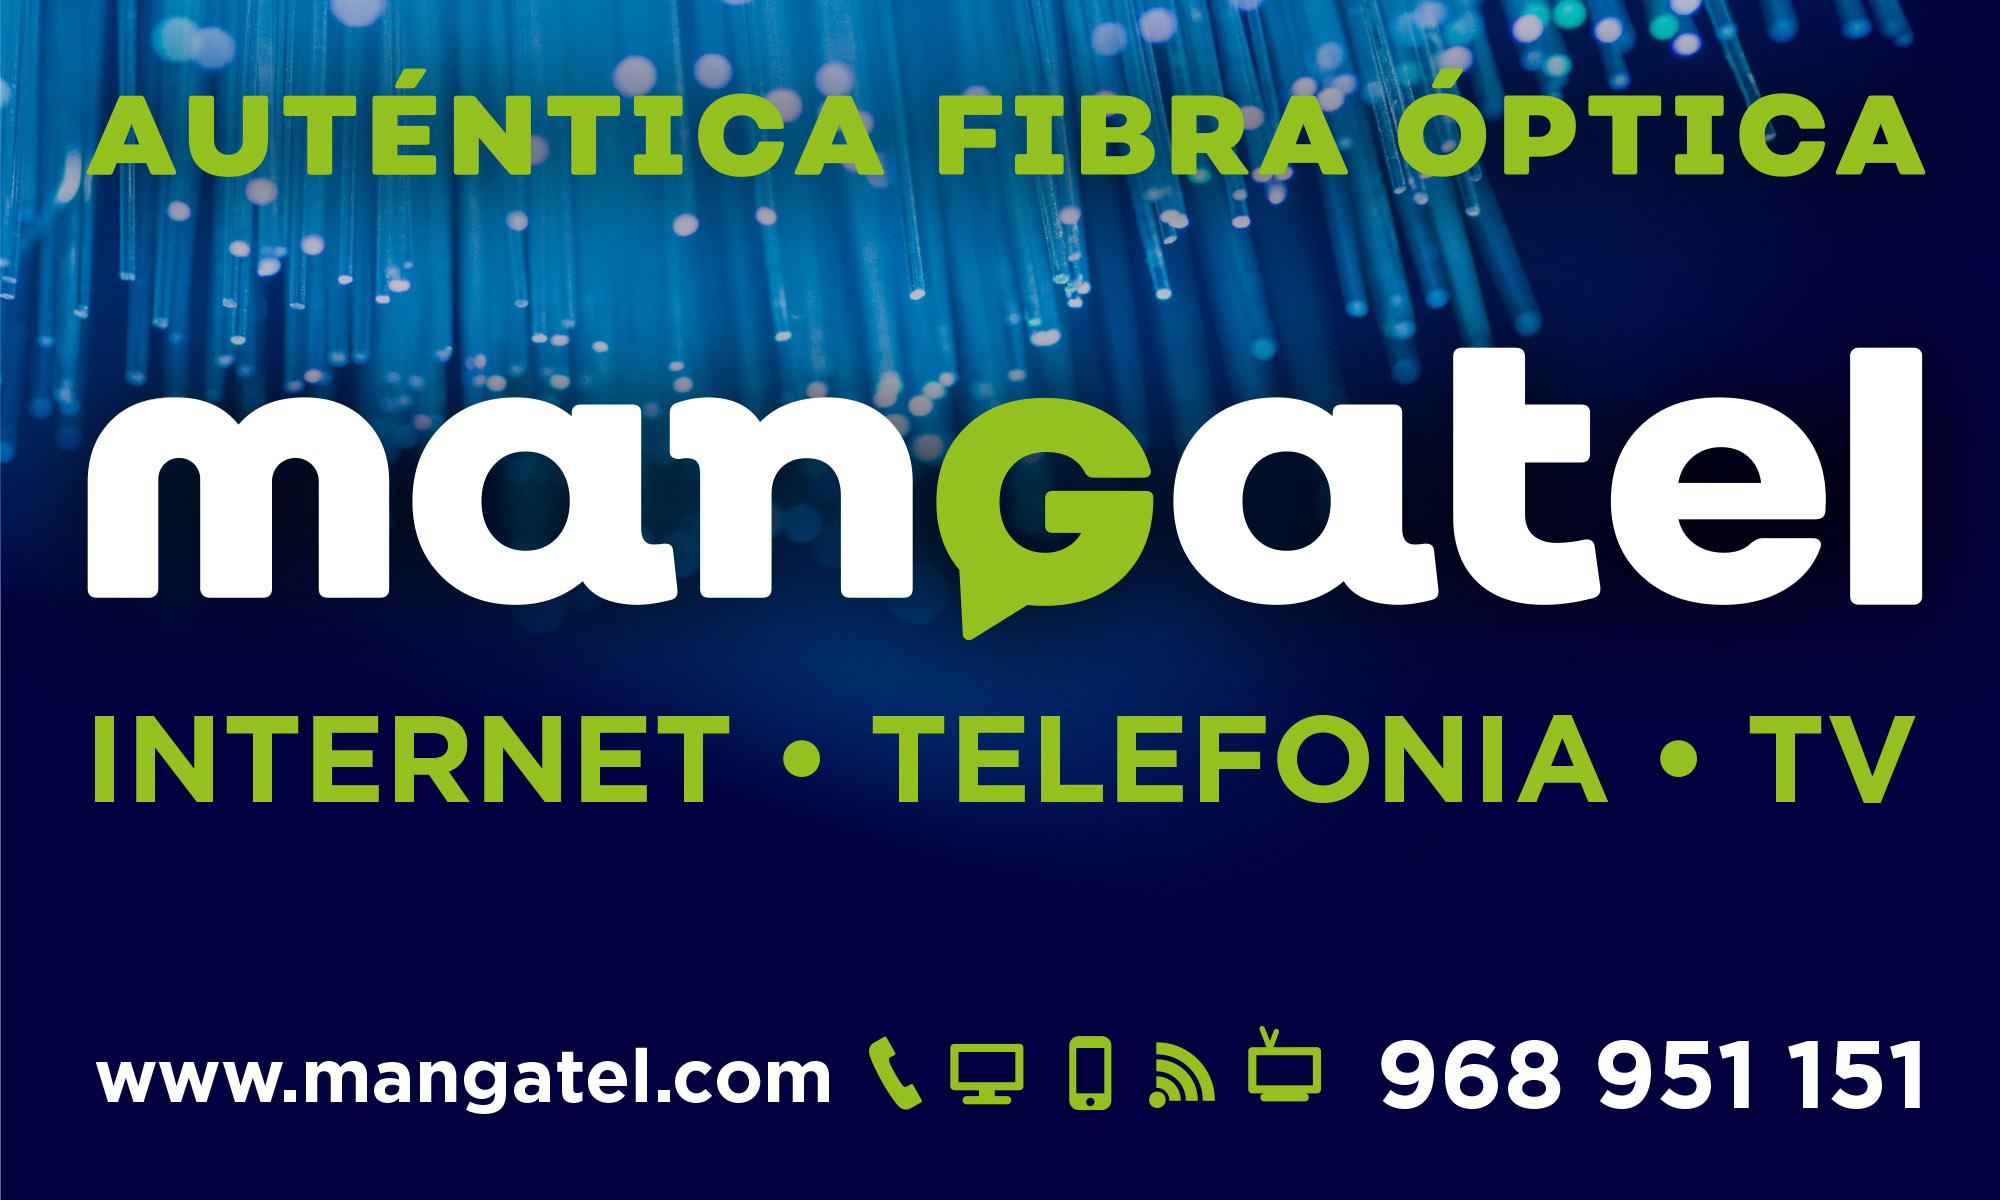 Fibra óptica Mangatel La Manga Cabo de Palos Playa Honda Playa Paraíso Los Urrutias Cartagena San Javier